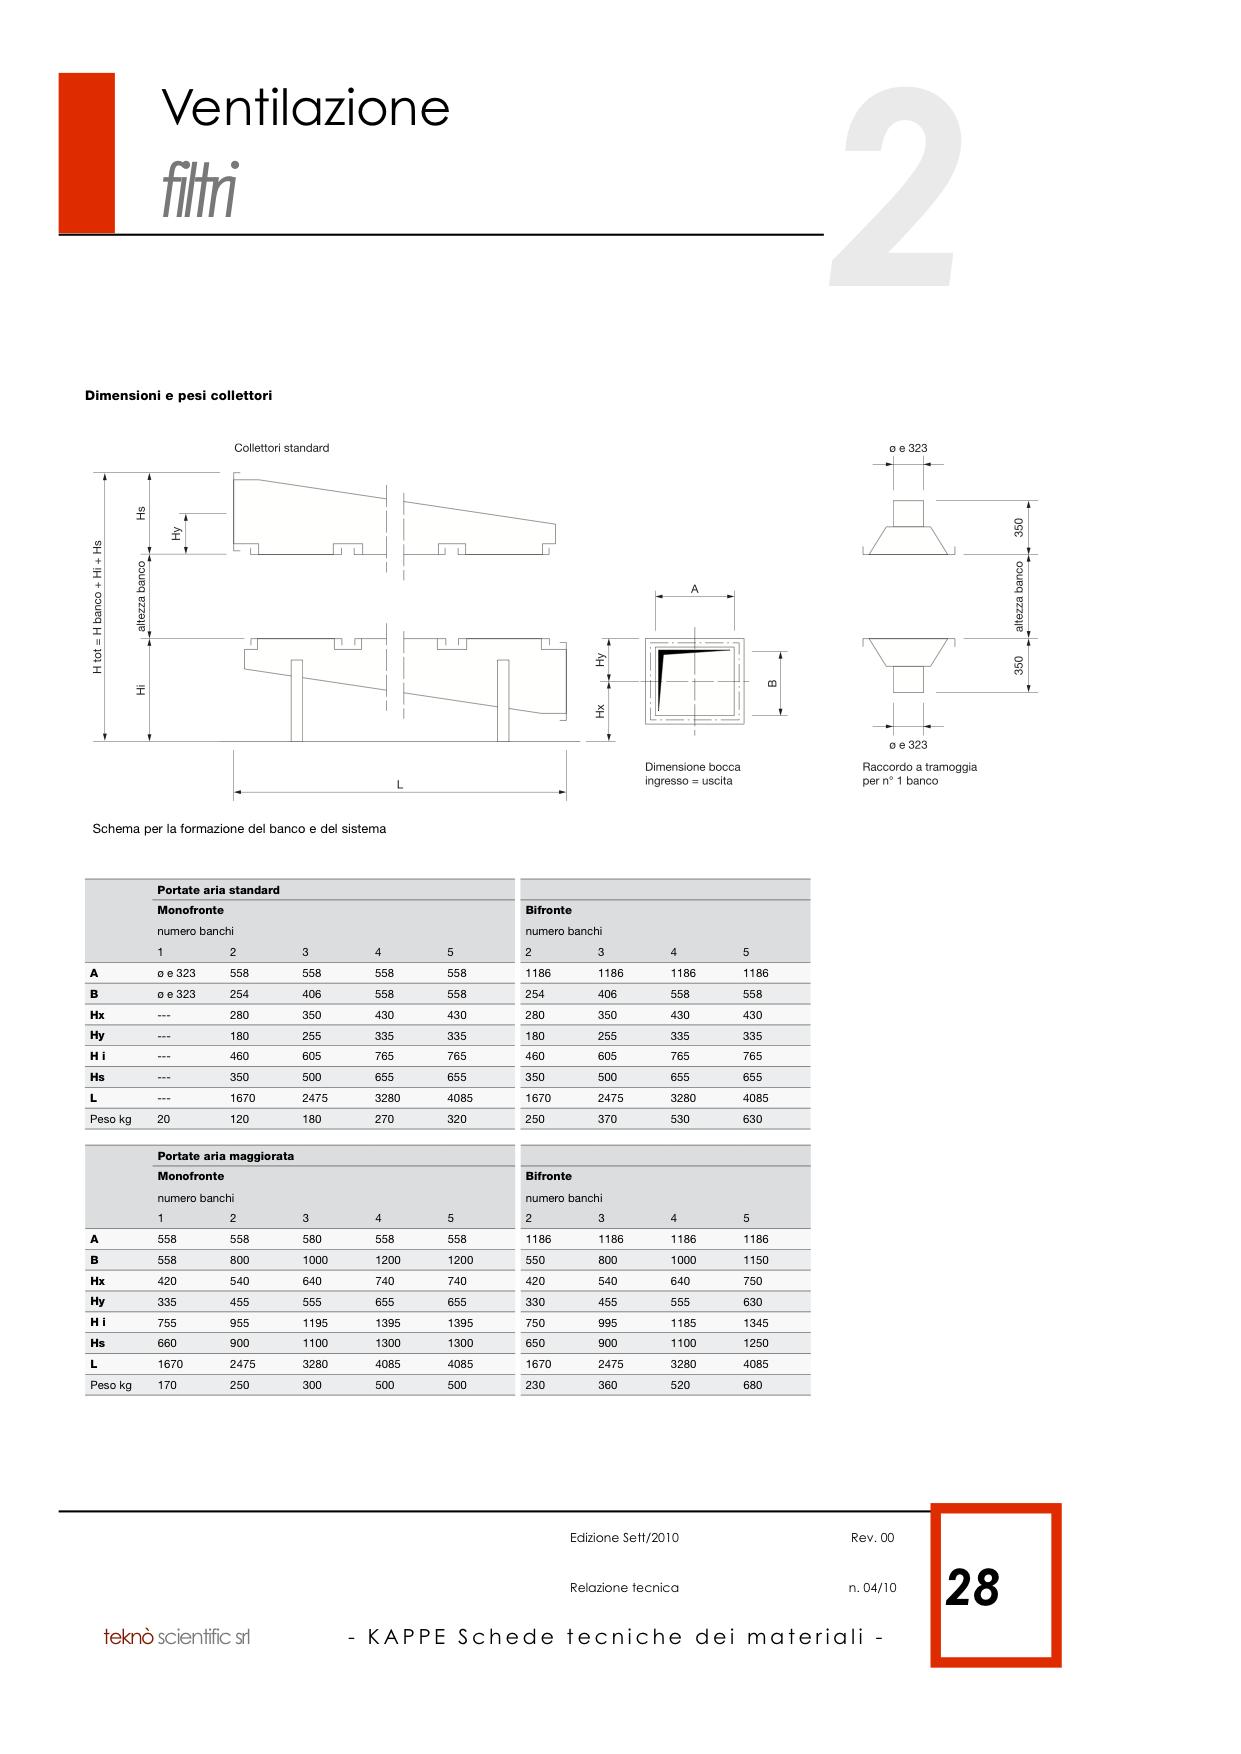 KAPPE Schede tecniche materiali copia 8.png